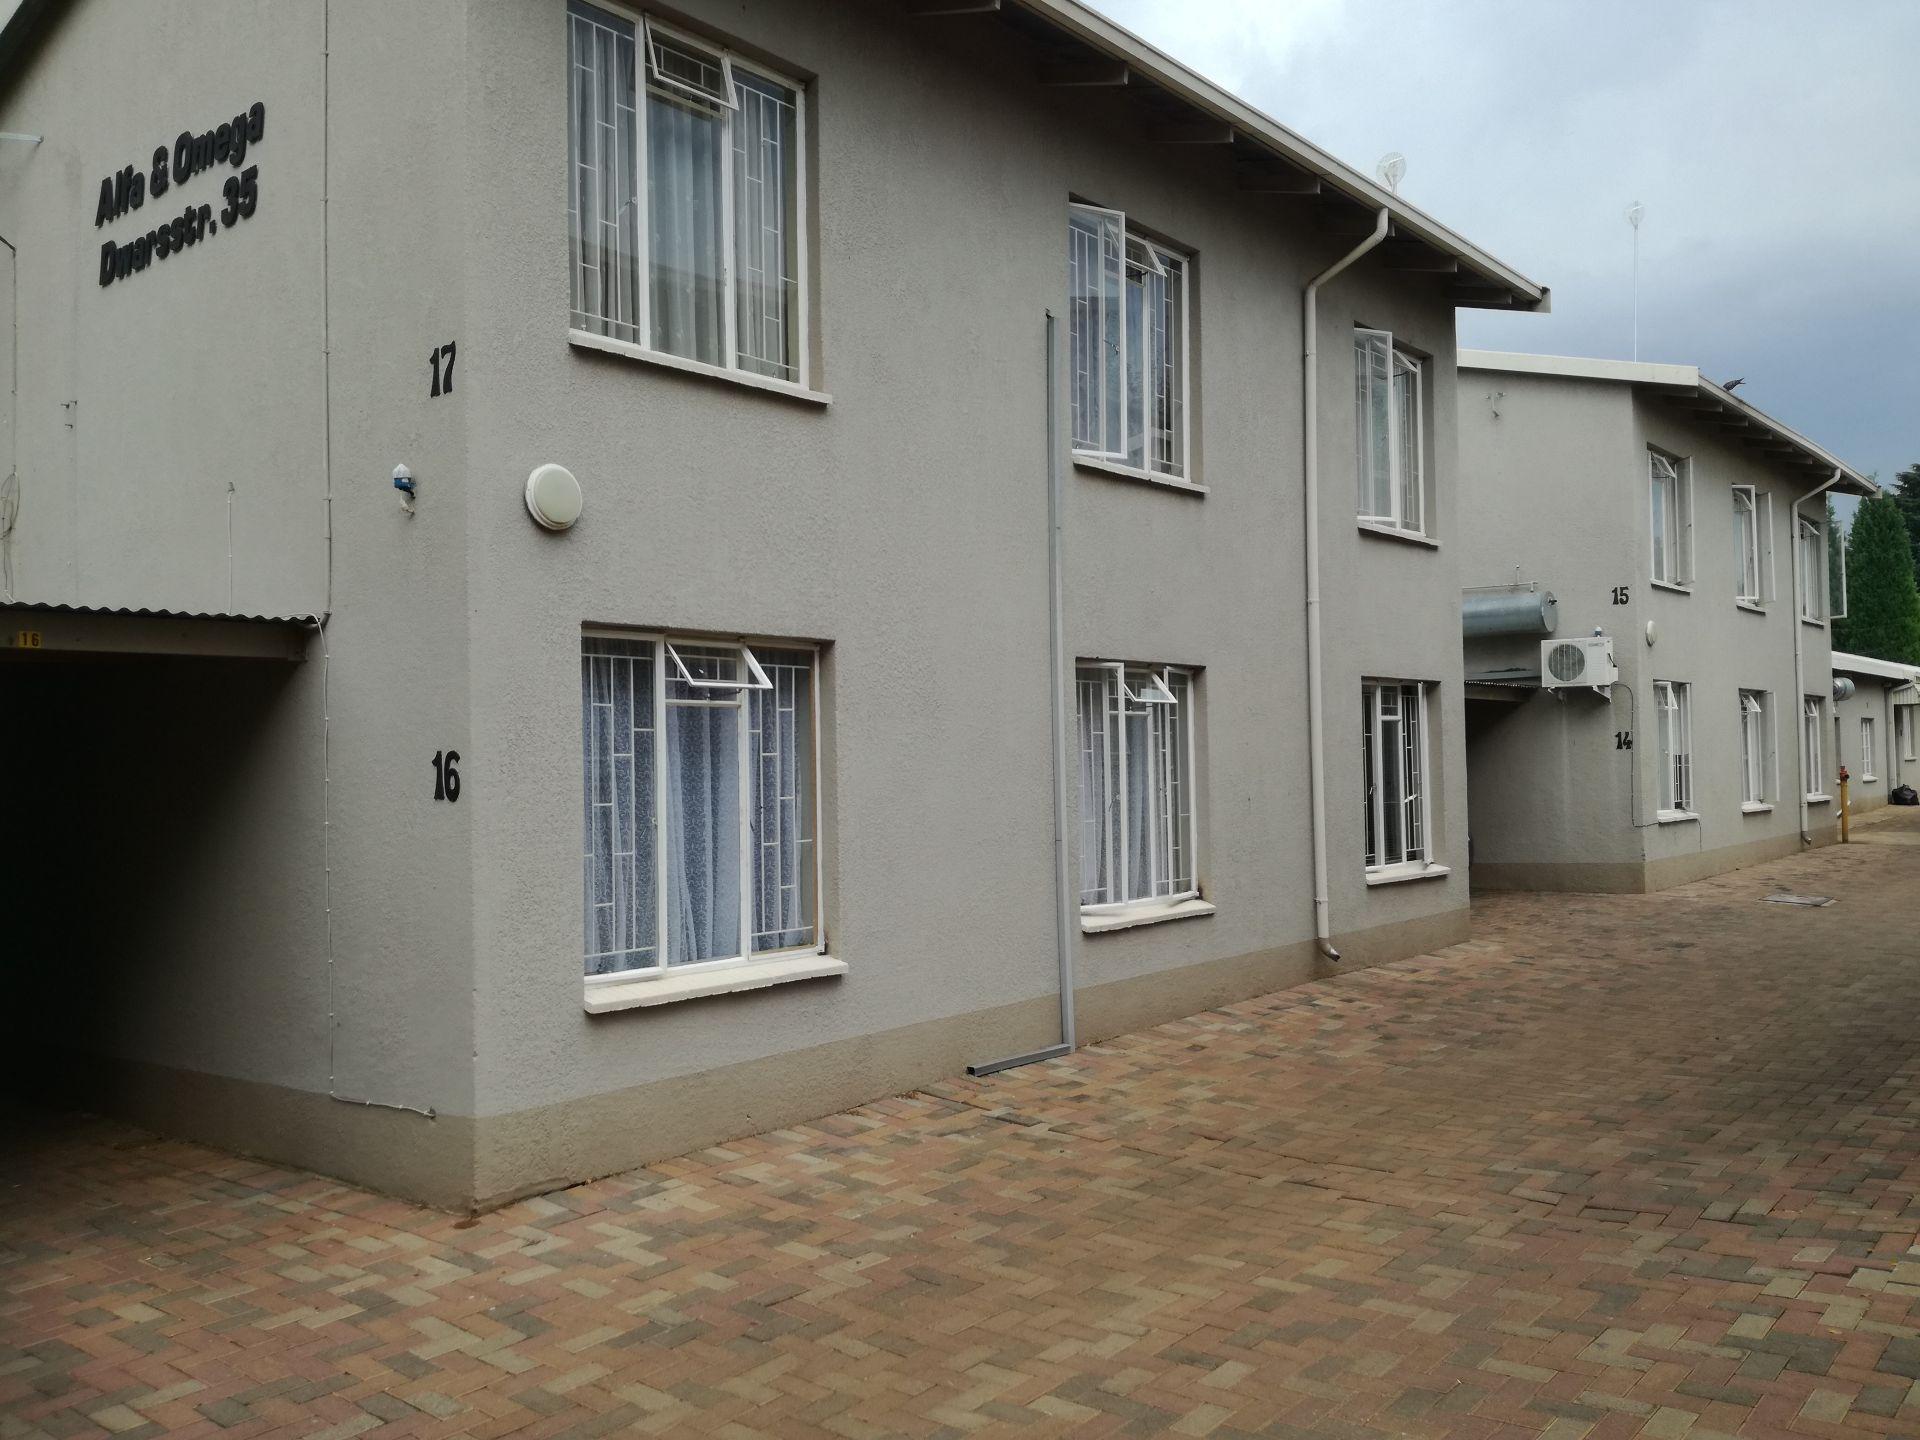 Potchefstroom, Bult West Property  | Houses For Sale Bult West, BULT WEST, House 2 bedrooms property for sale Price:690,000